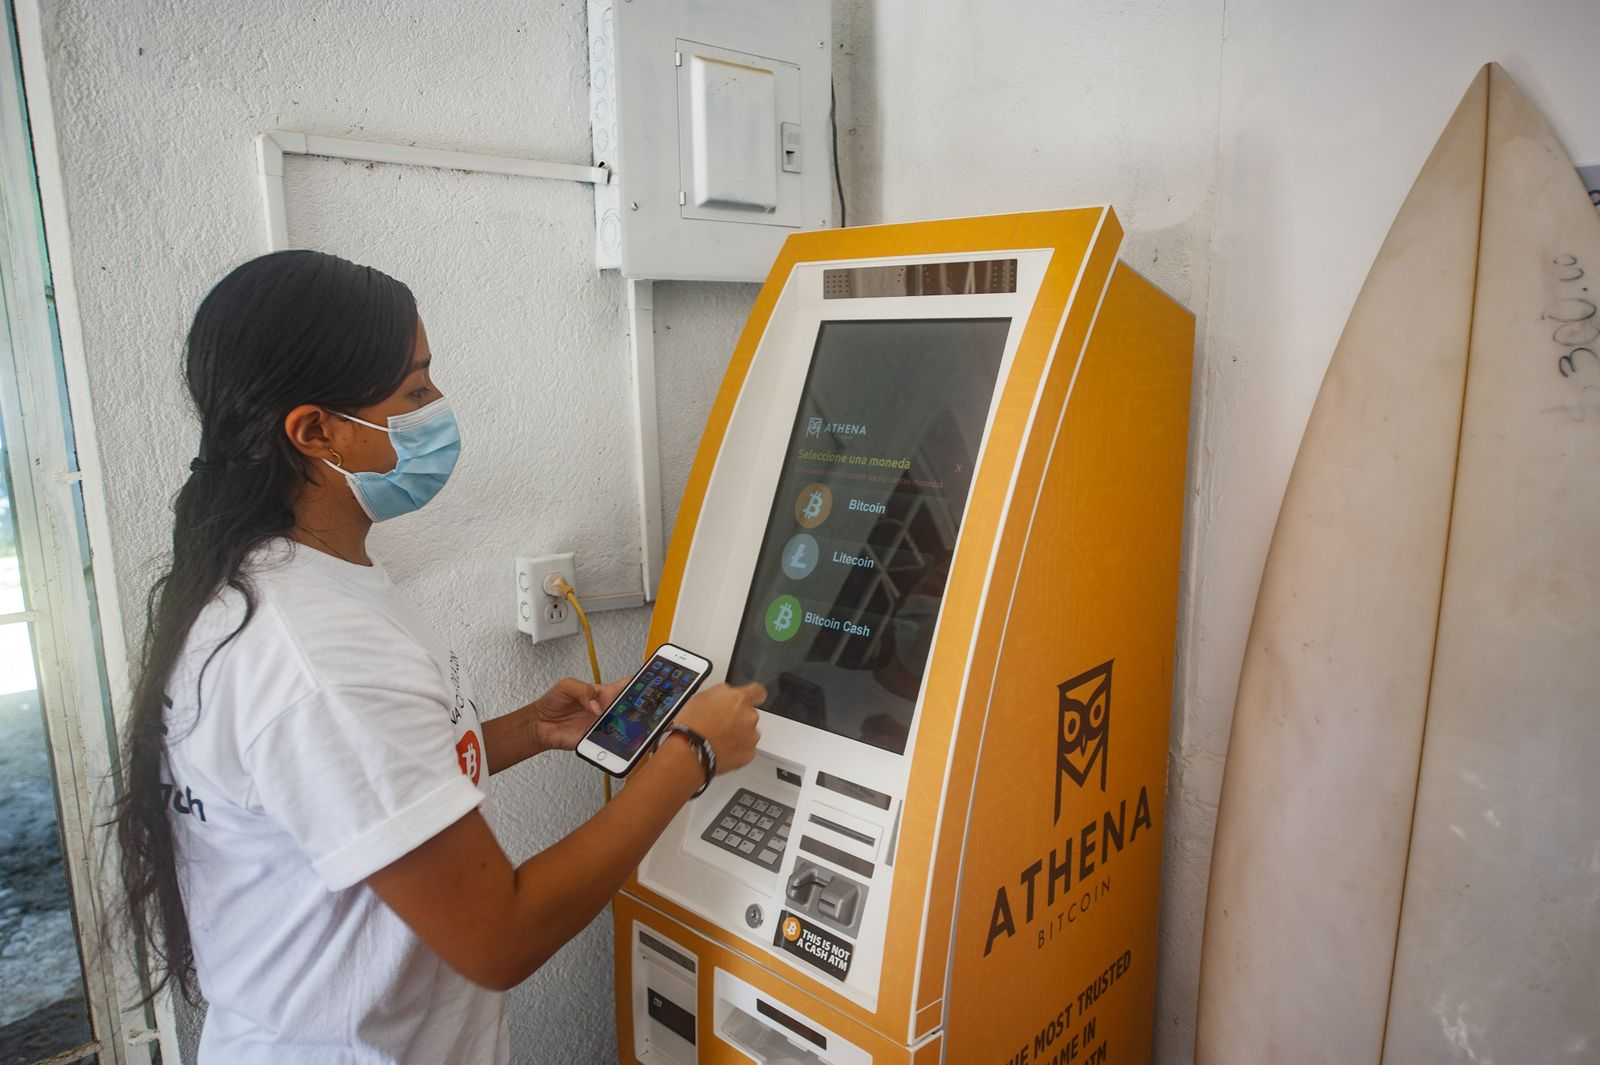 A woman withdraws money from a Bitcoin ATM. Salvadoran